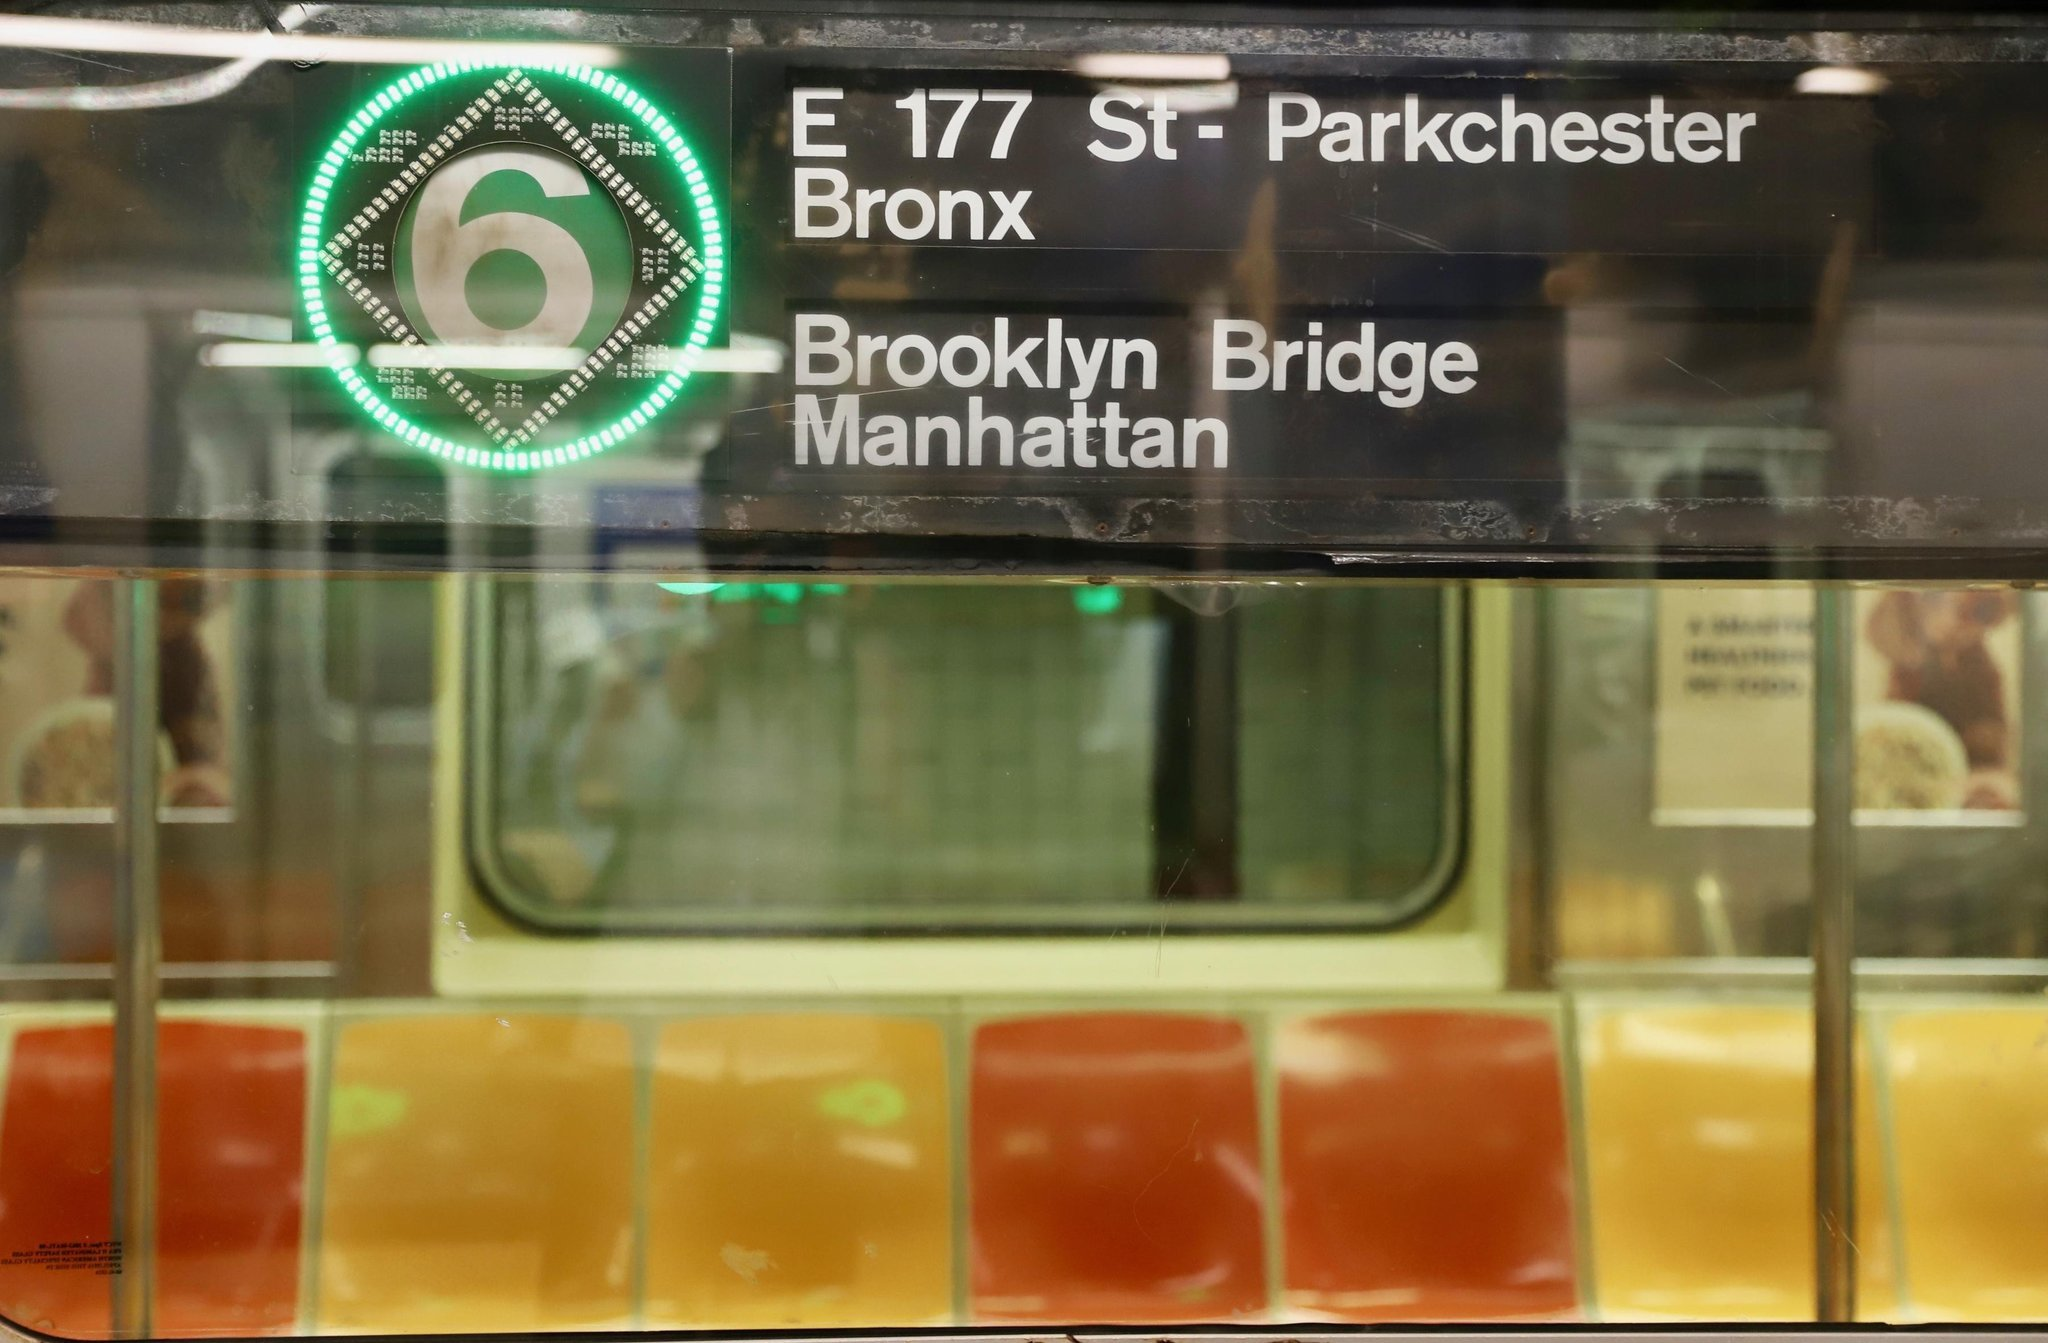 Man lying on tracks fatally struck by Bronx subway train